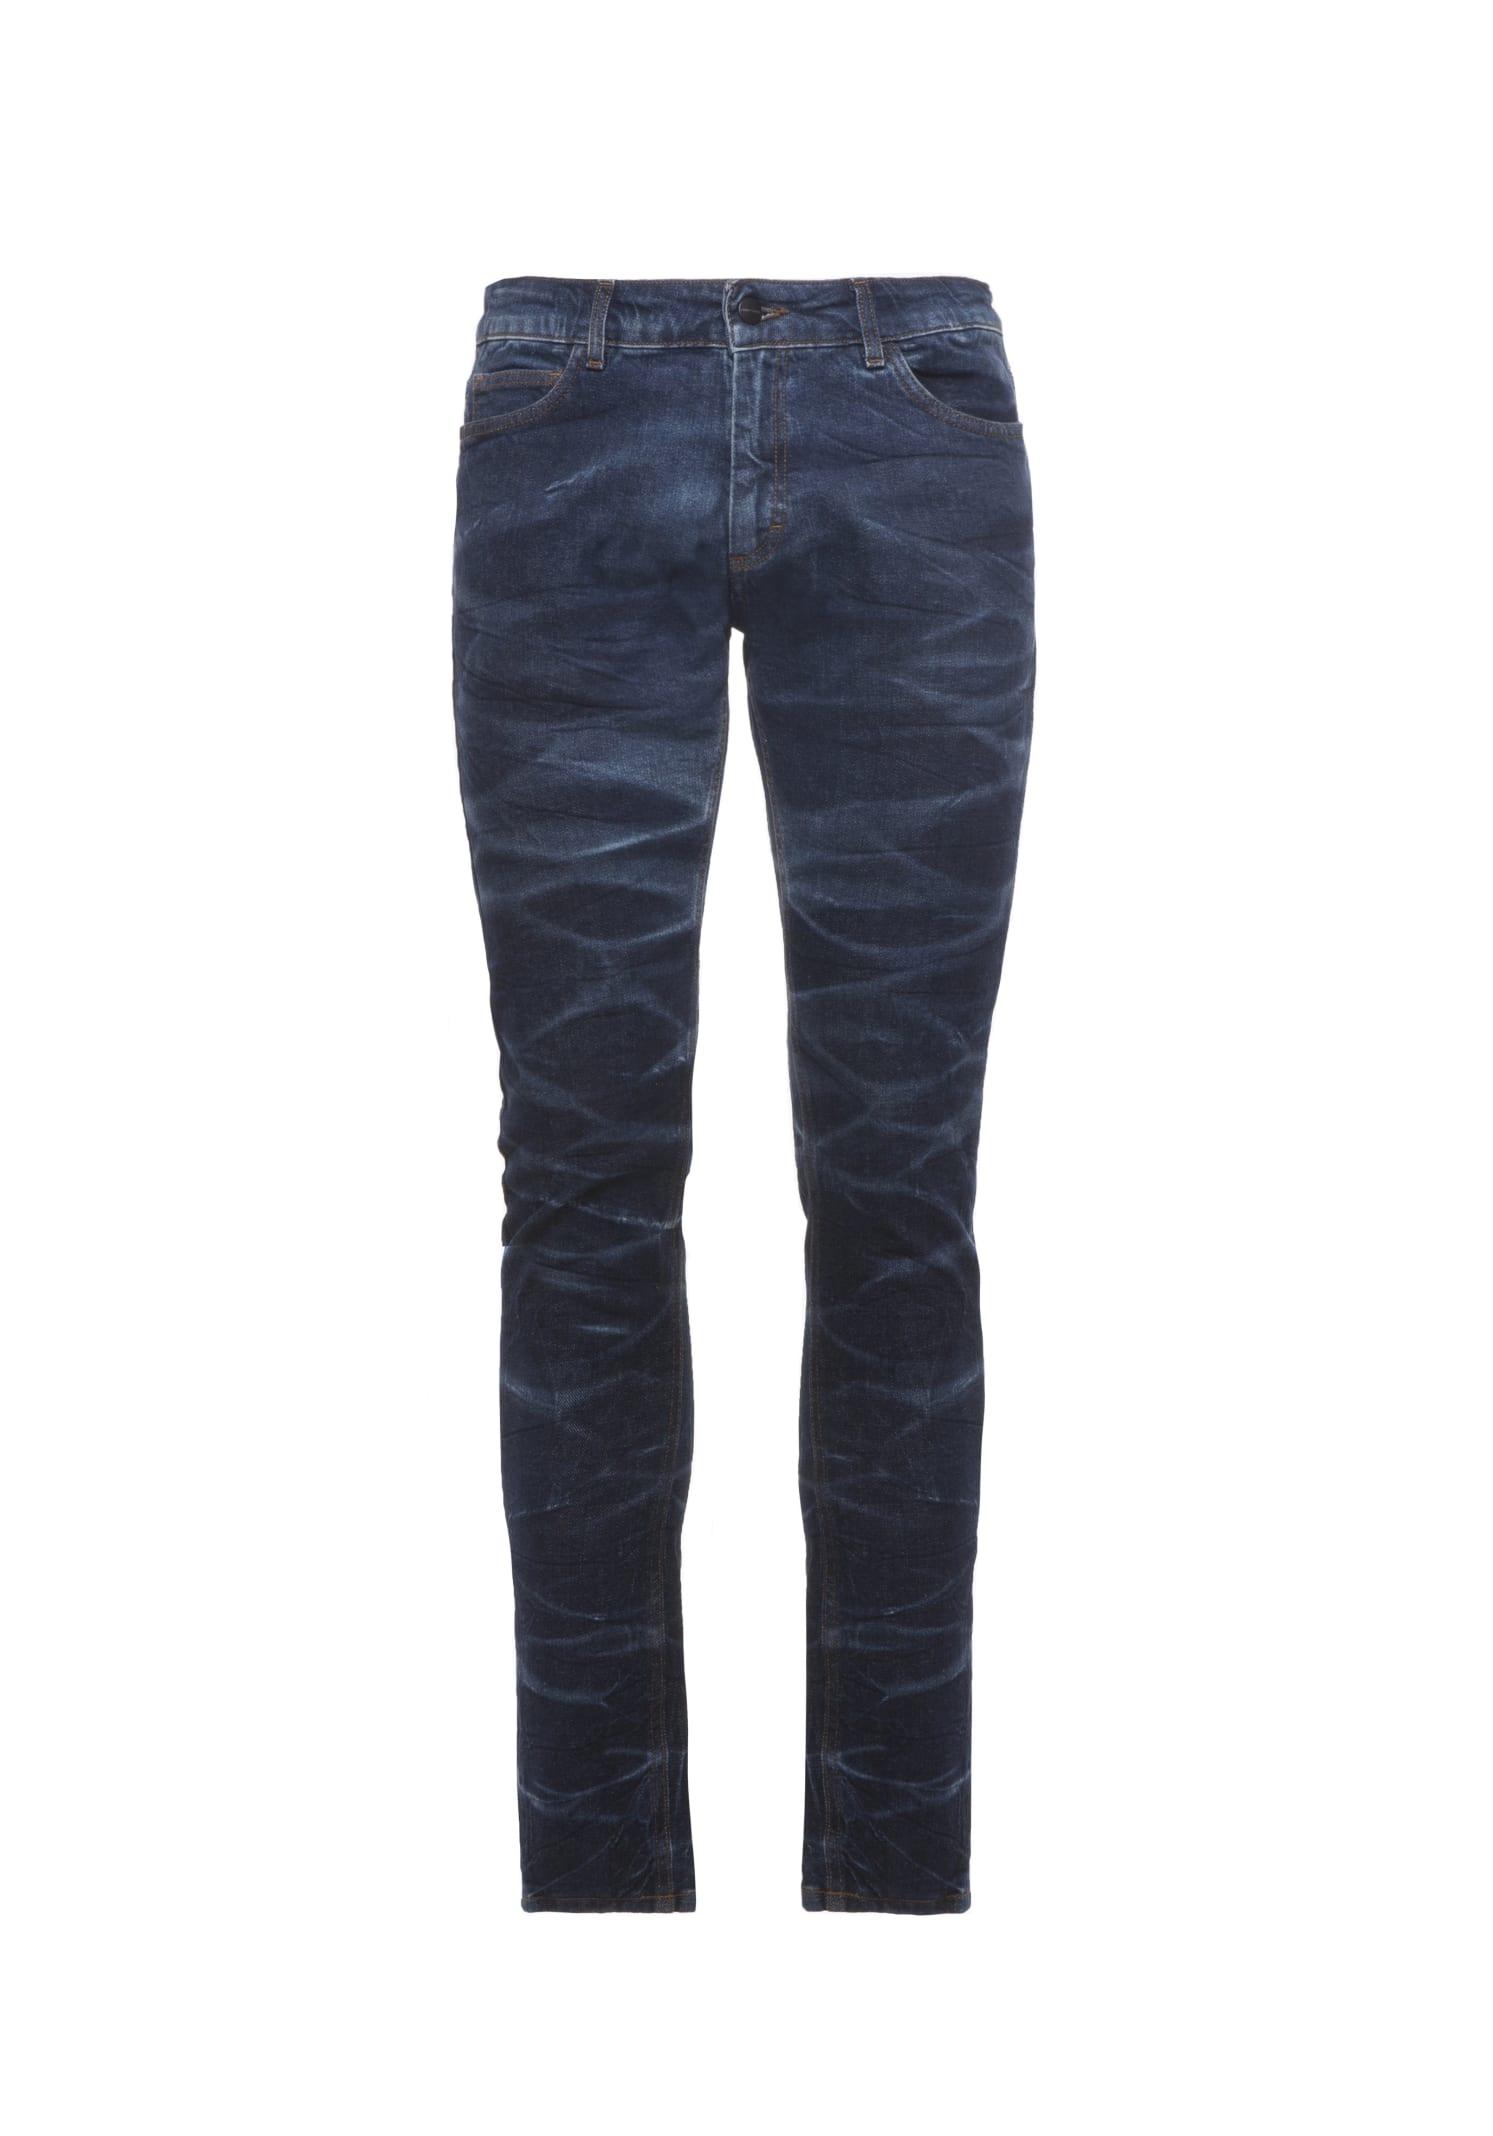 Jeans Denim Marble Blue